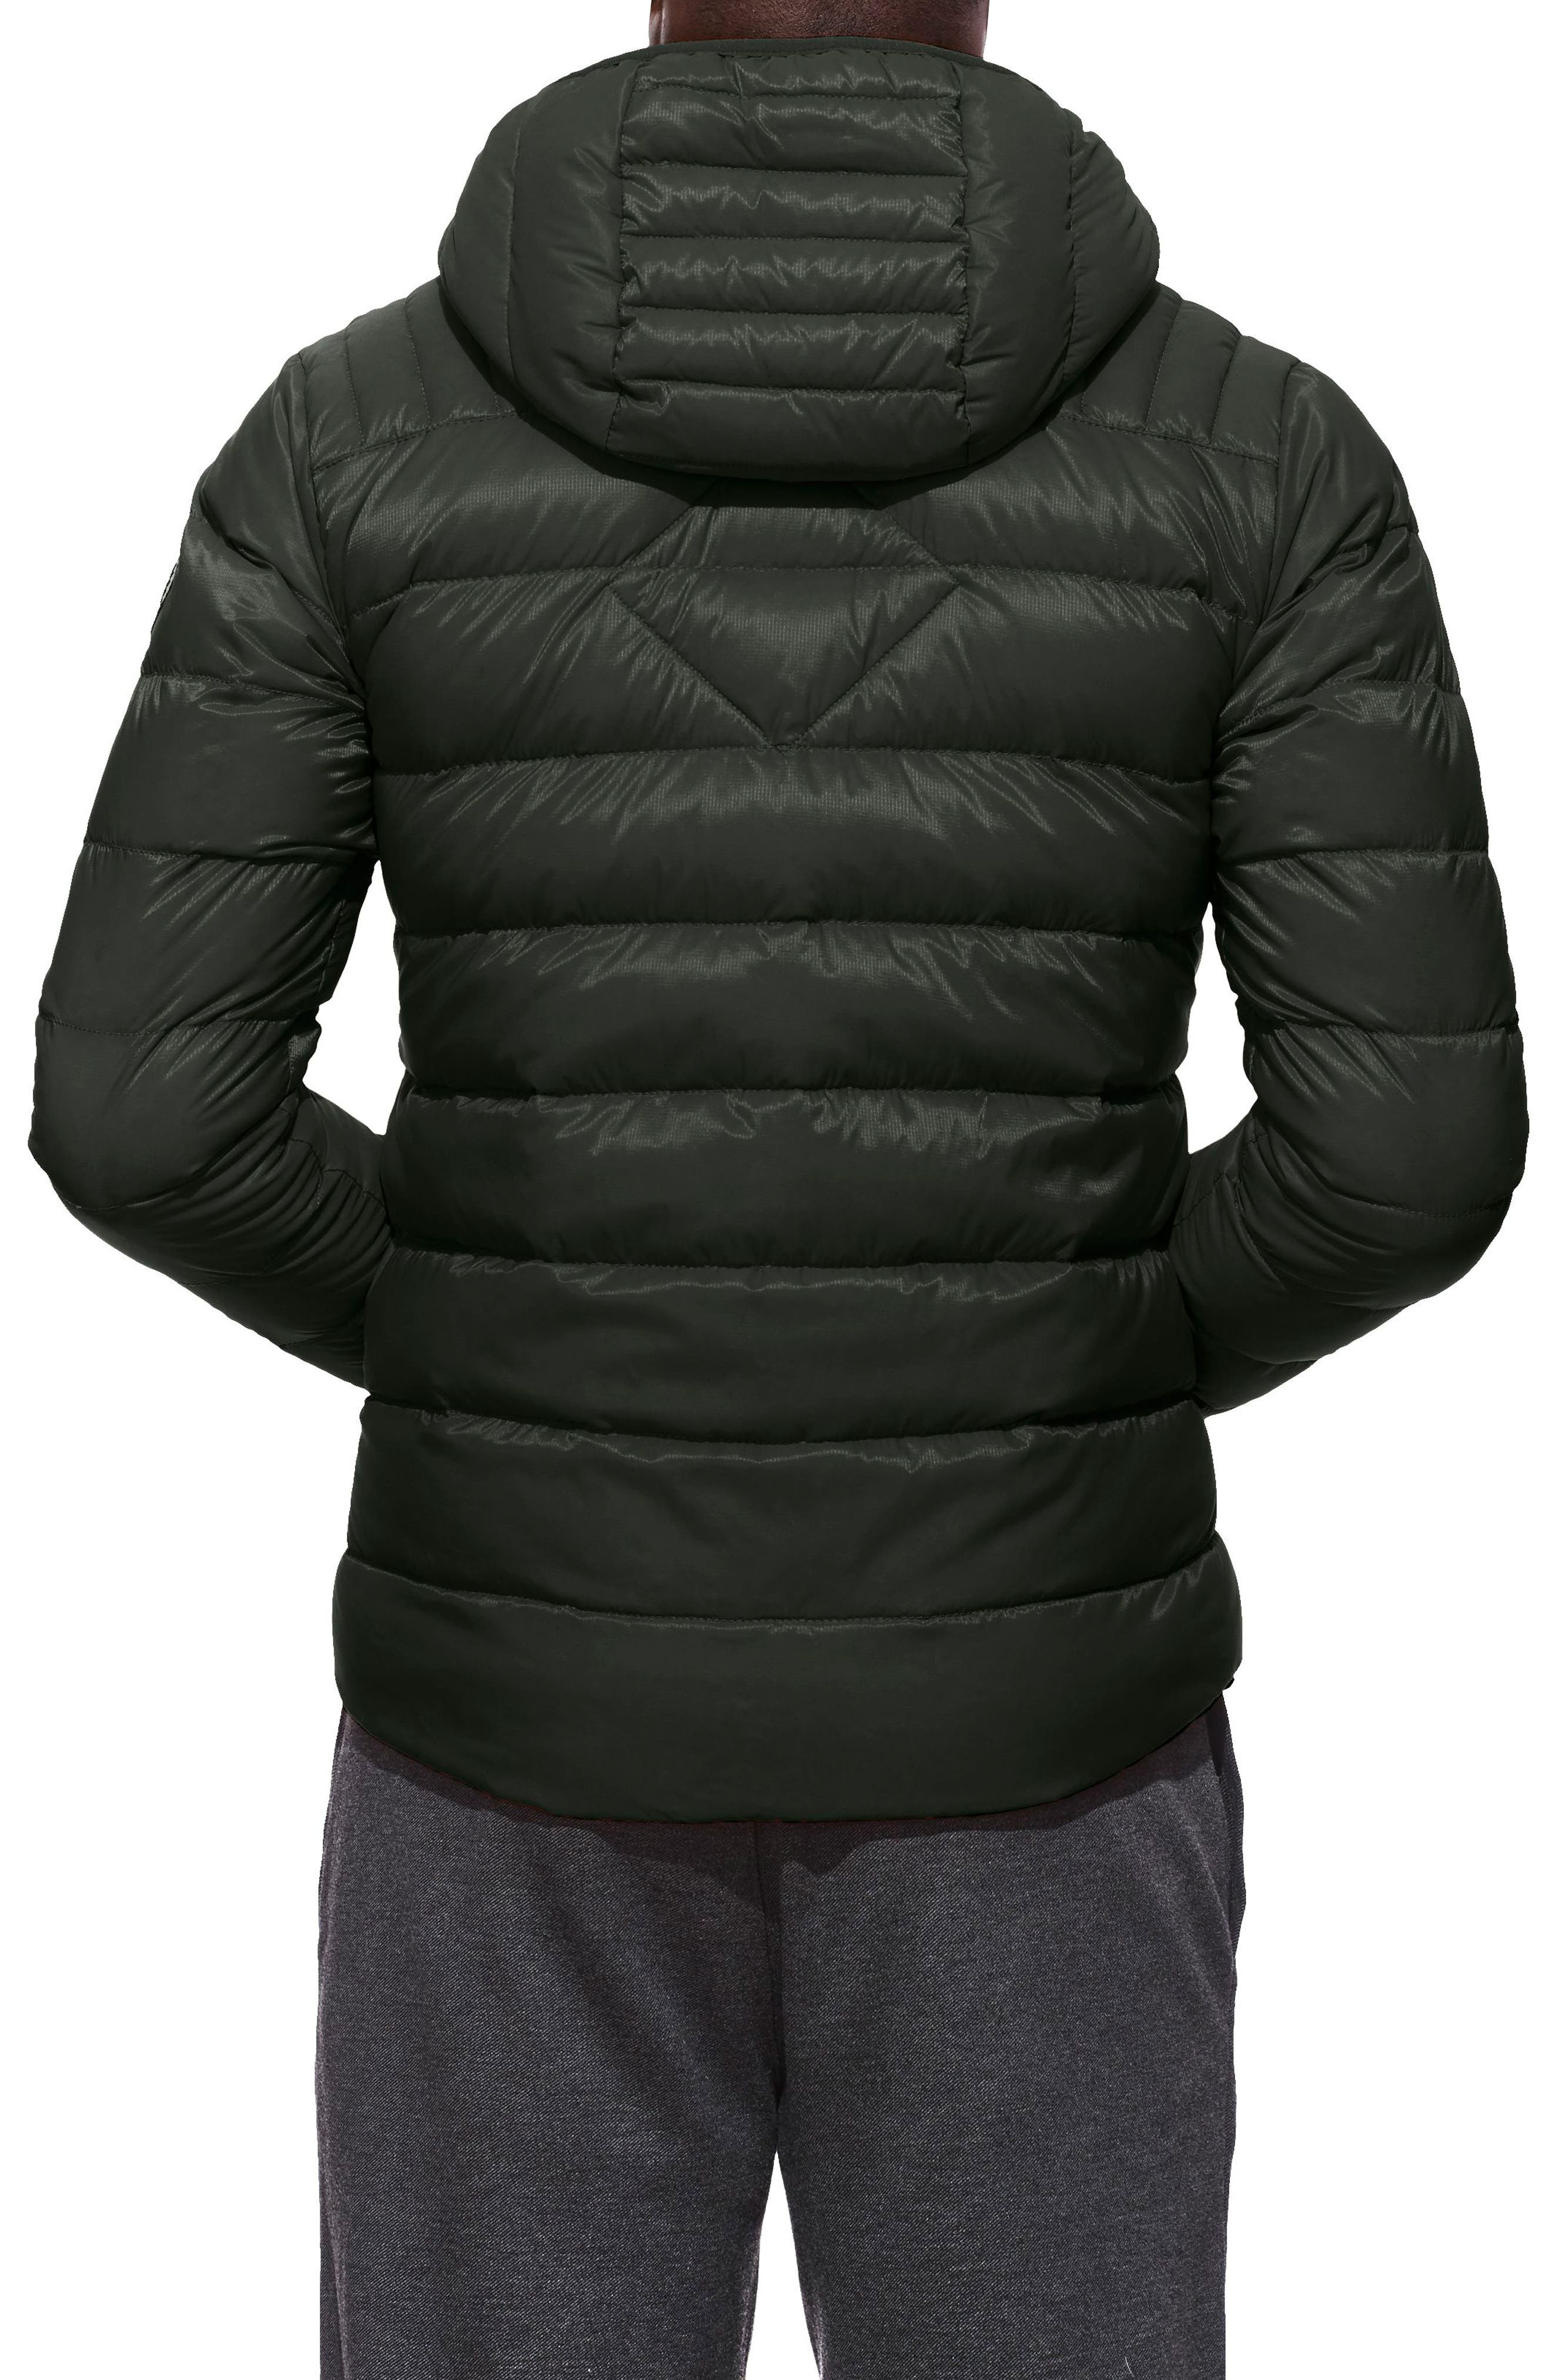 Brookvale Slim Fit Hooded Down Jacket,                             Alternate thumbnail 2, color,                             VOLCANO/ BLACK